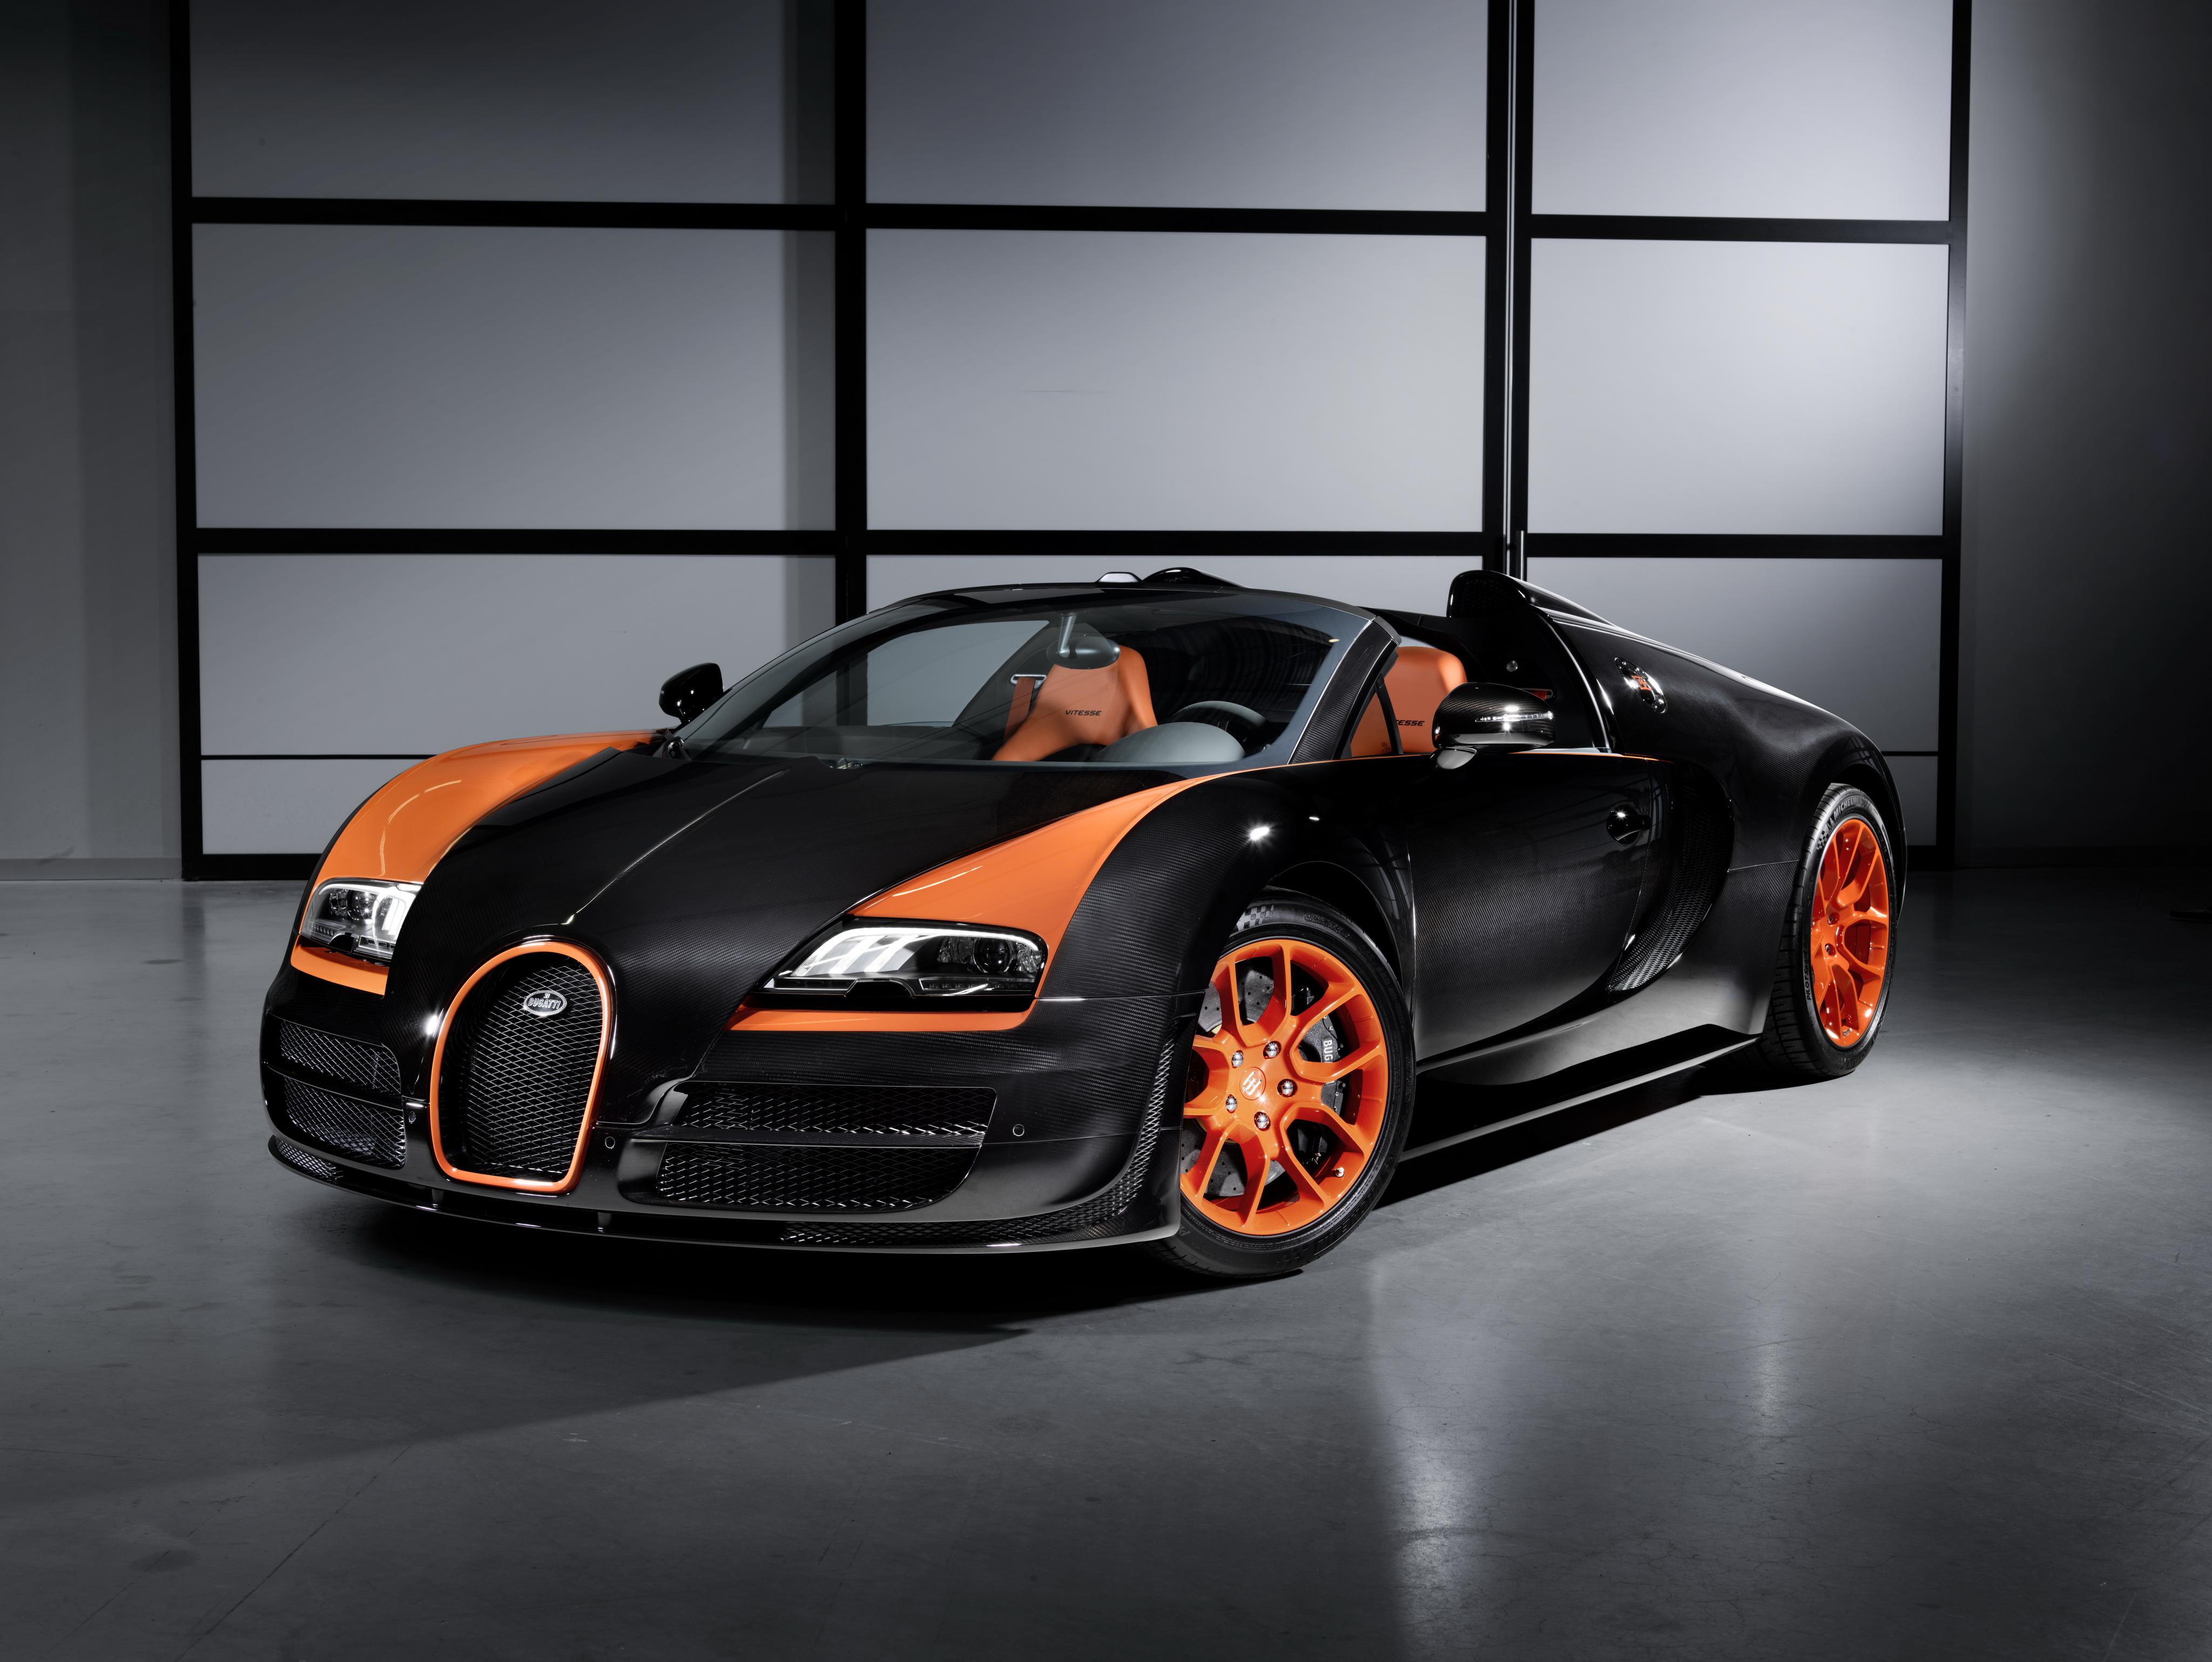 Bugatti Veyron Tesla killer